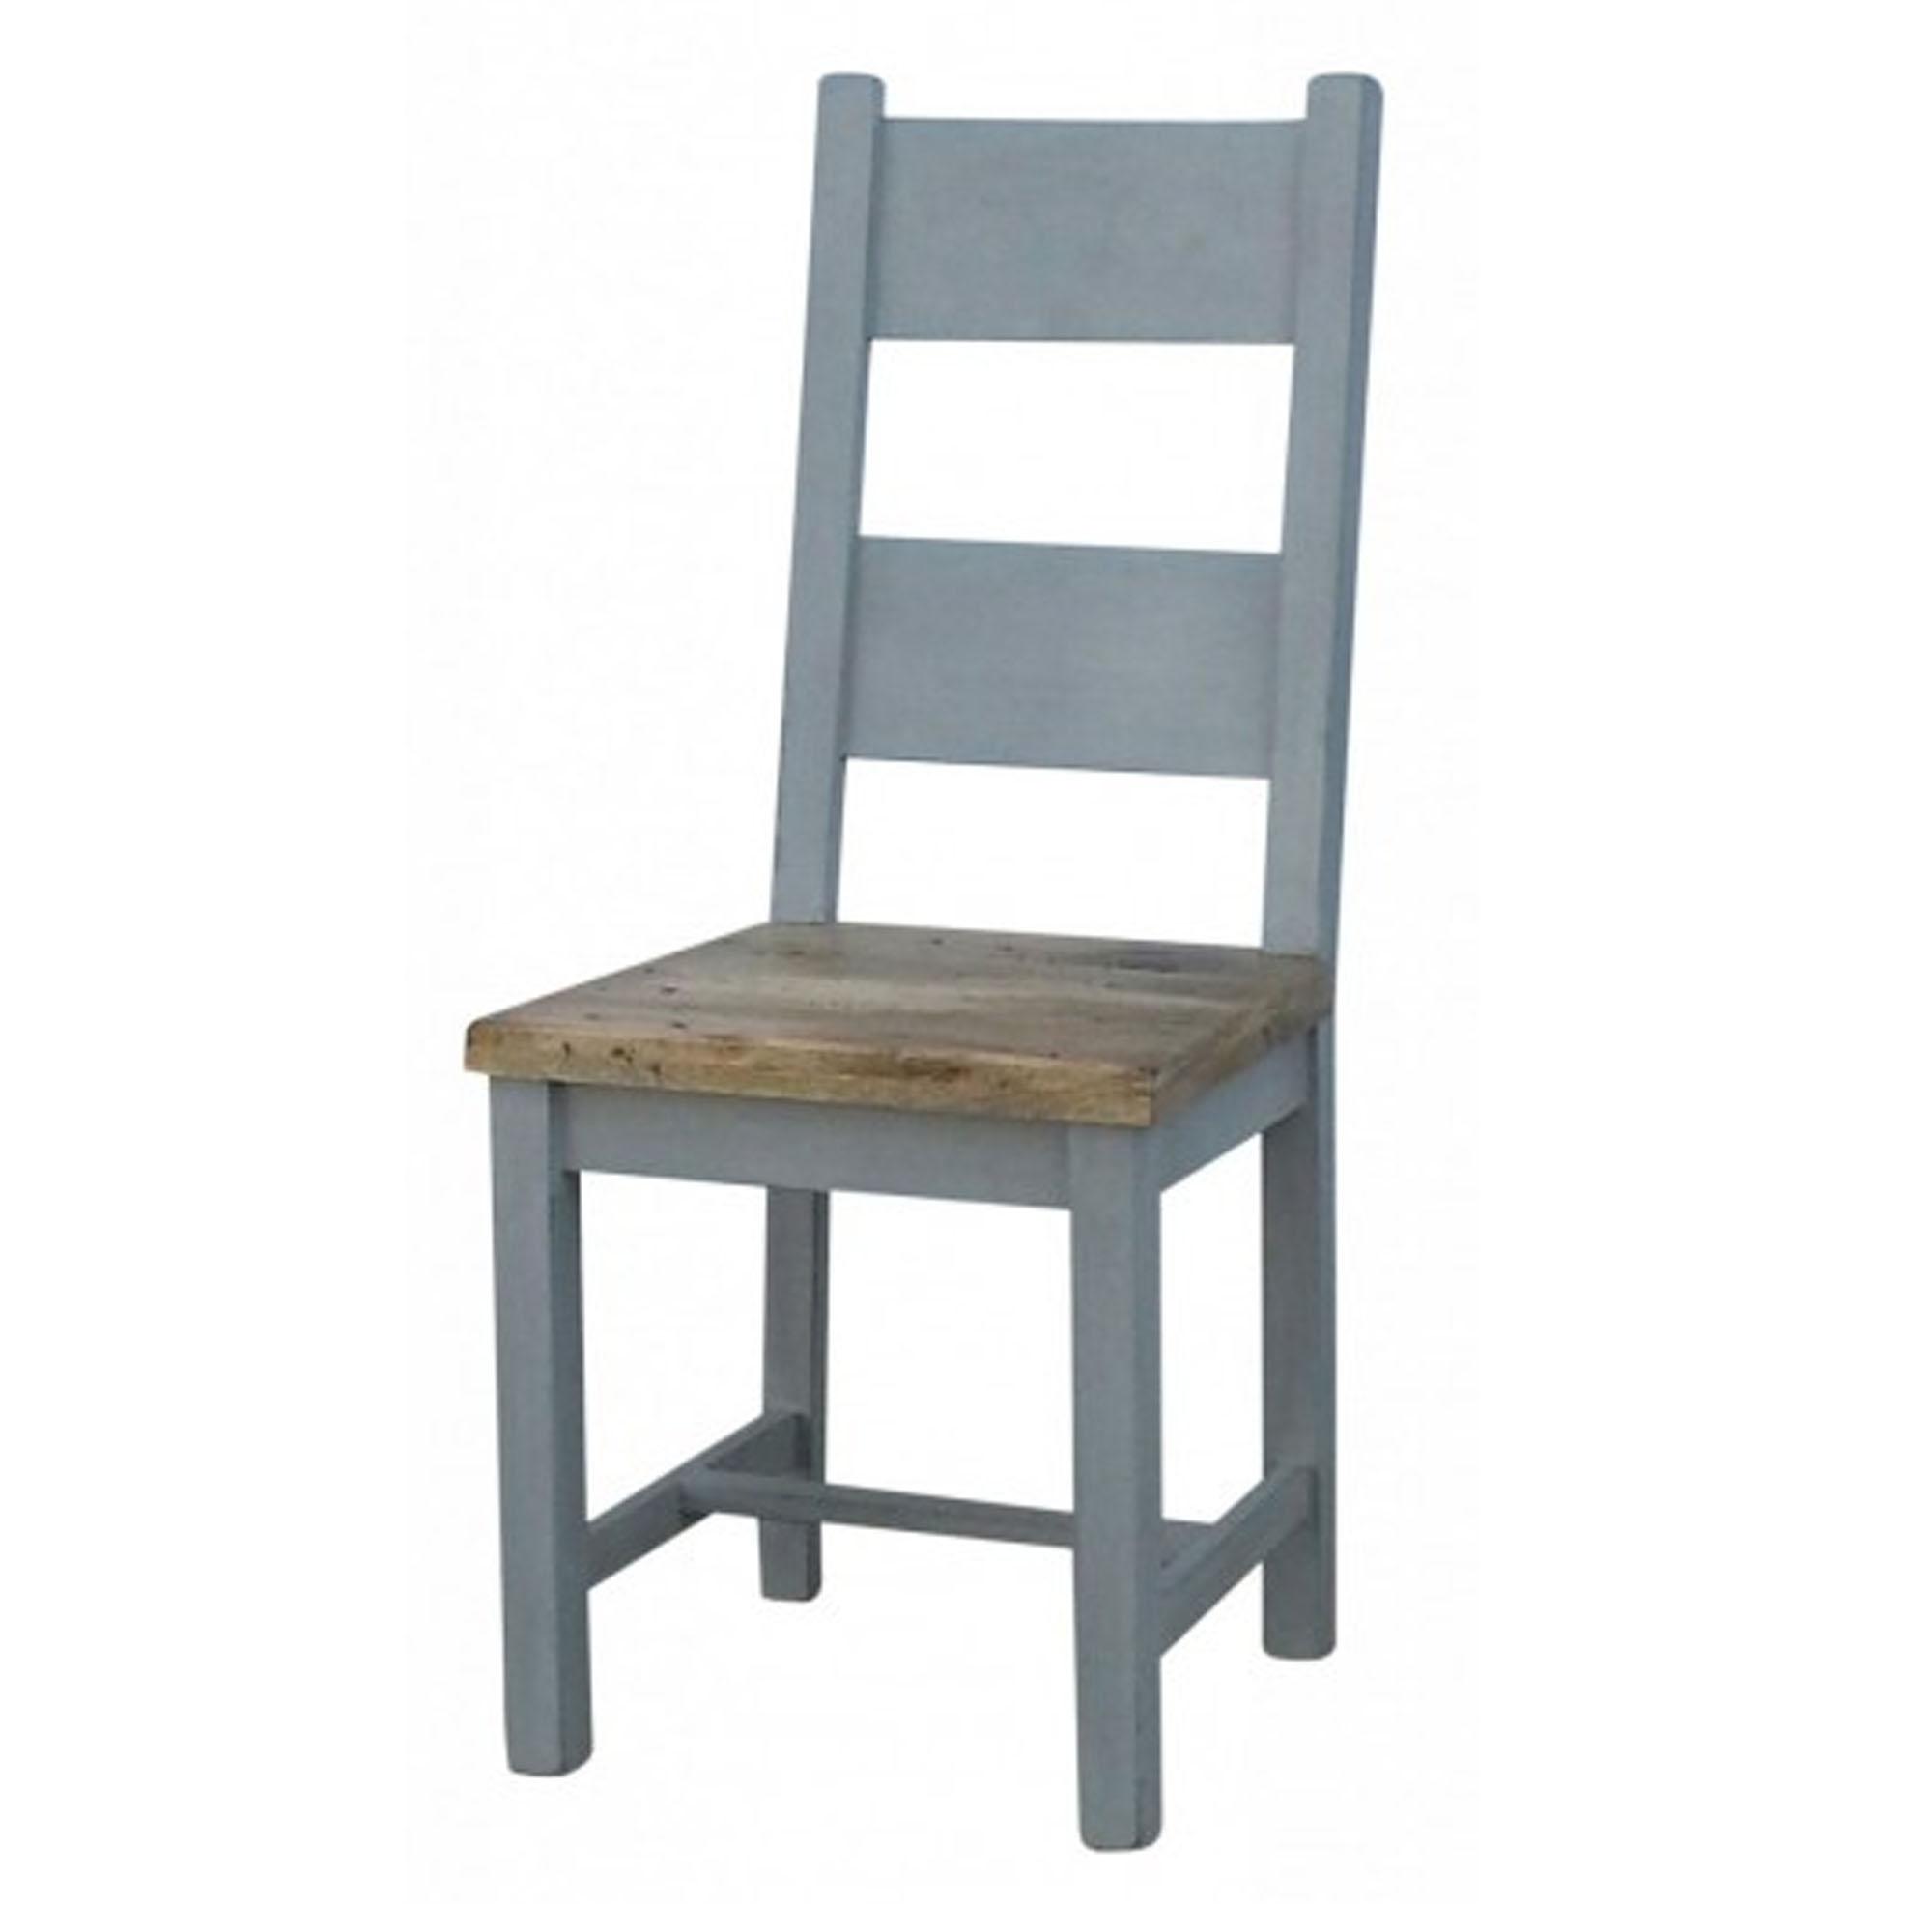 Colorado Shabby Chic Chair 1